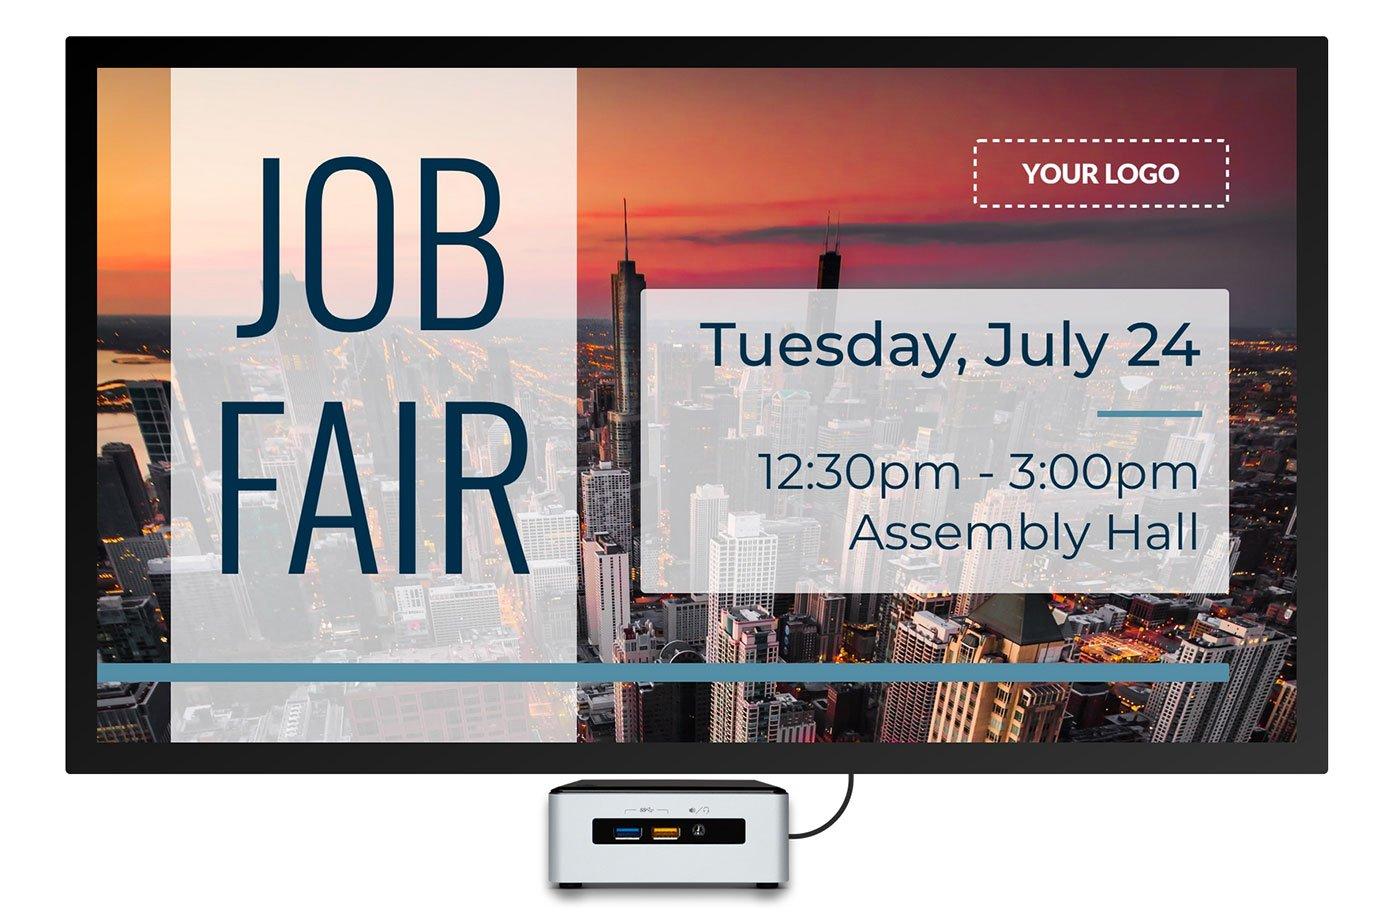 job fair hiring digital signage template